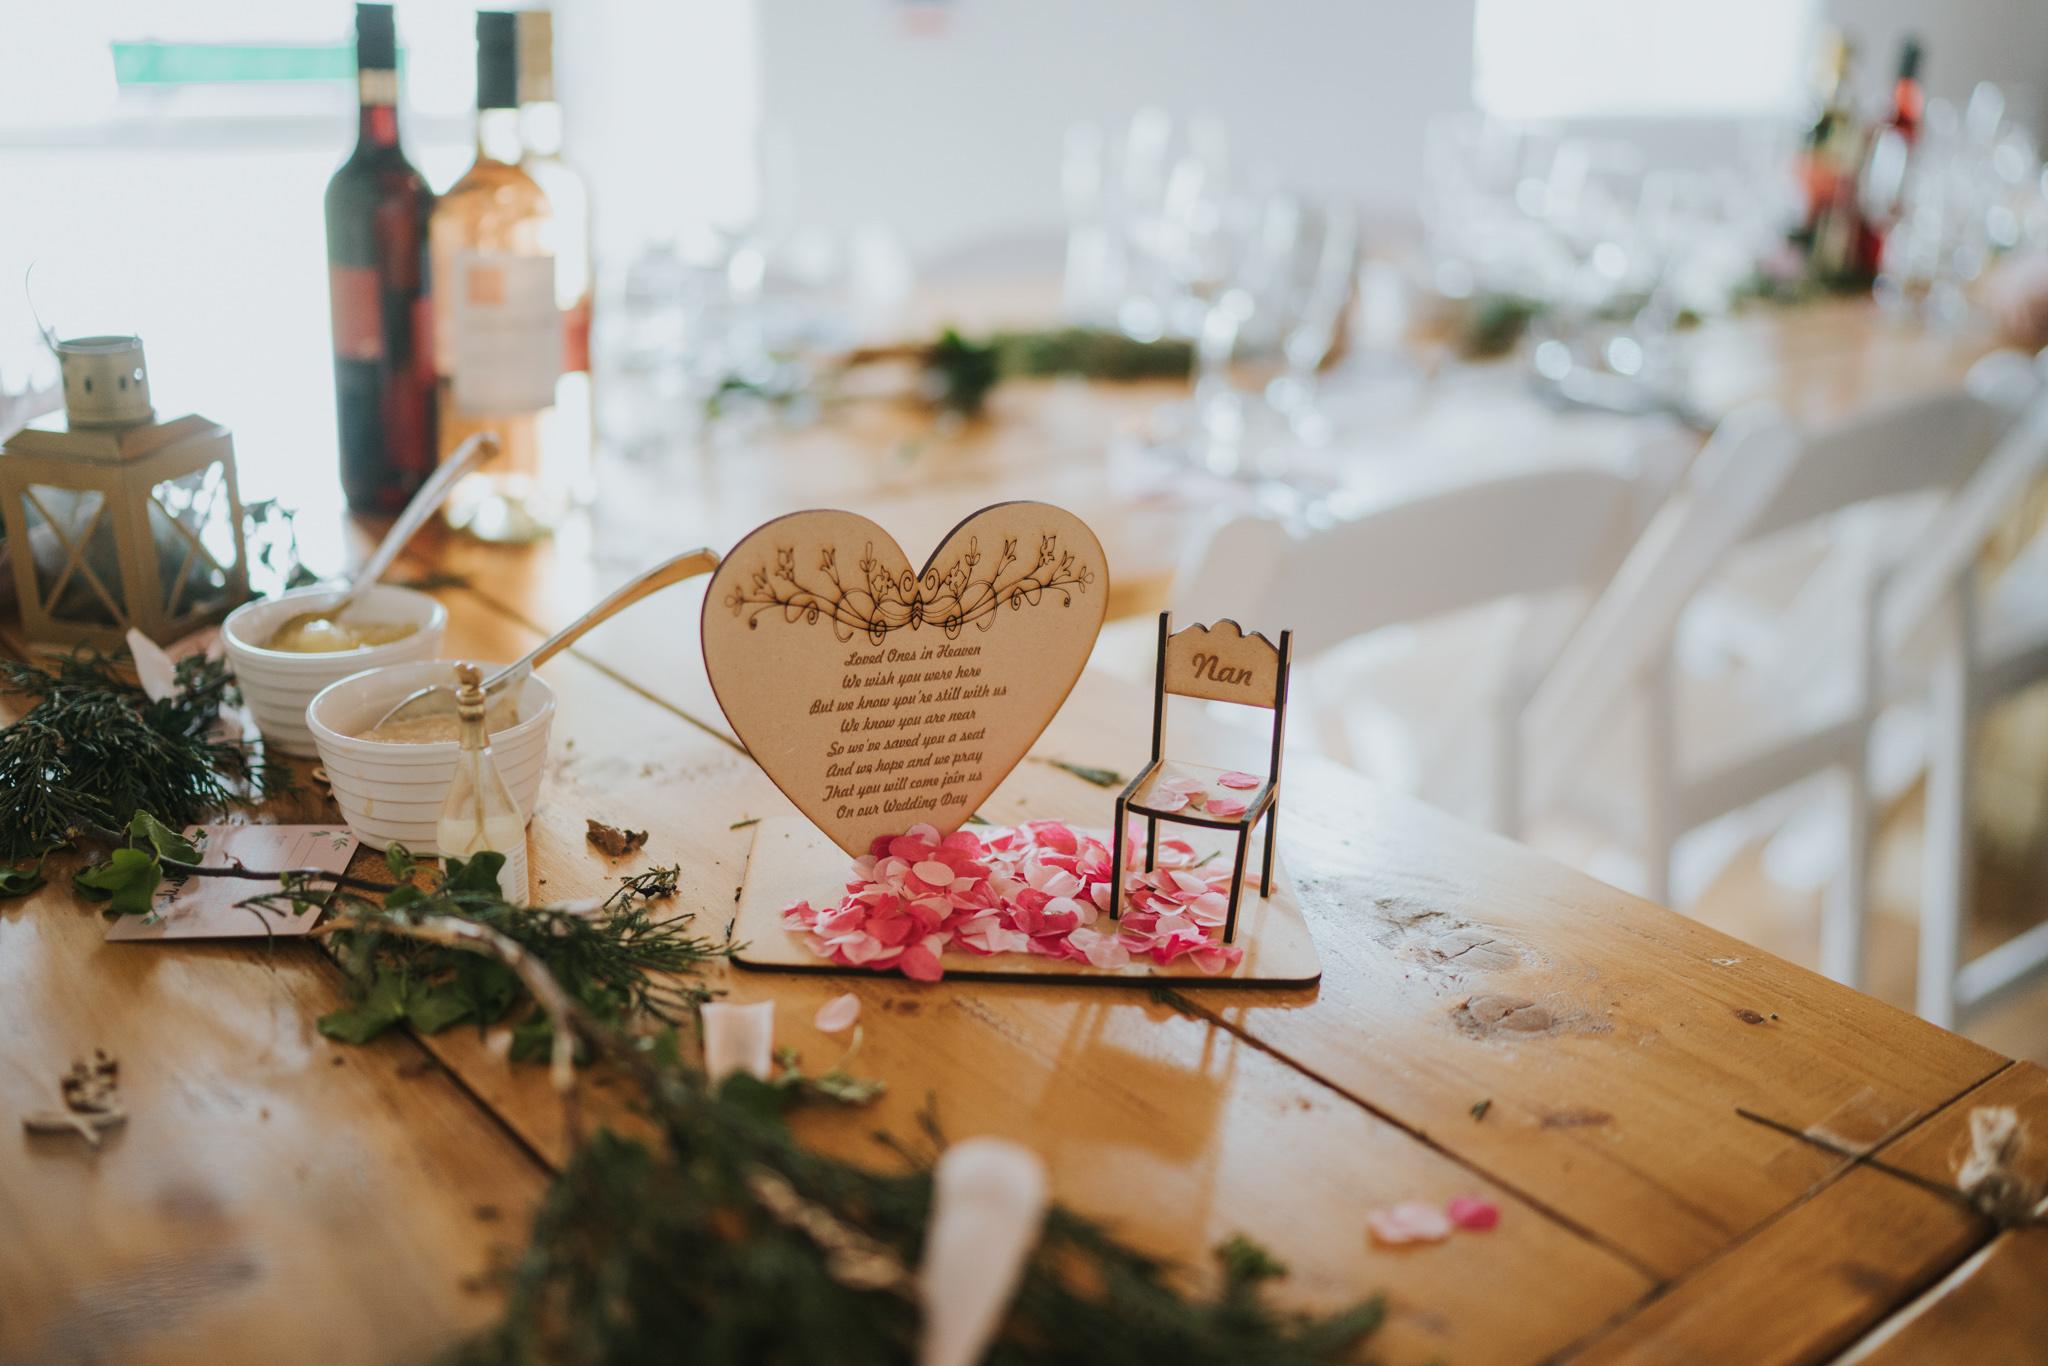 grace-sam-old-barn-clovelly-devon-wedding-photographer-grace-elizabeth-essex-suffolk-norfolk-wedding-photographer (70 of 132).jpg